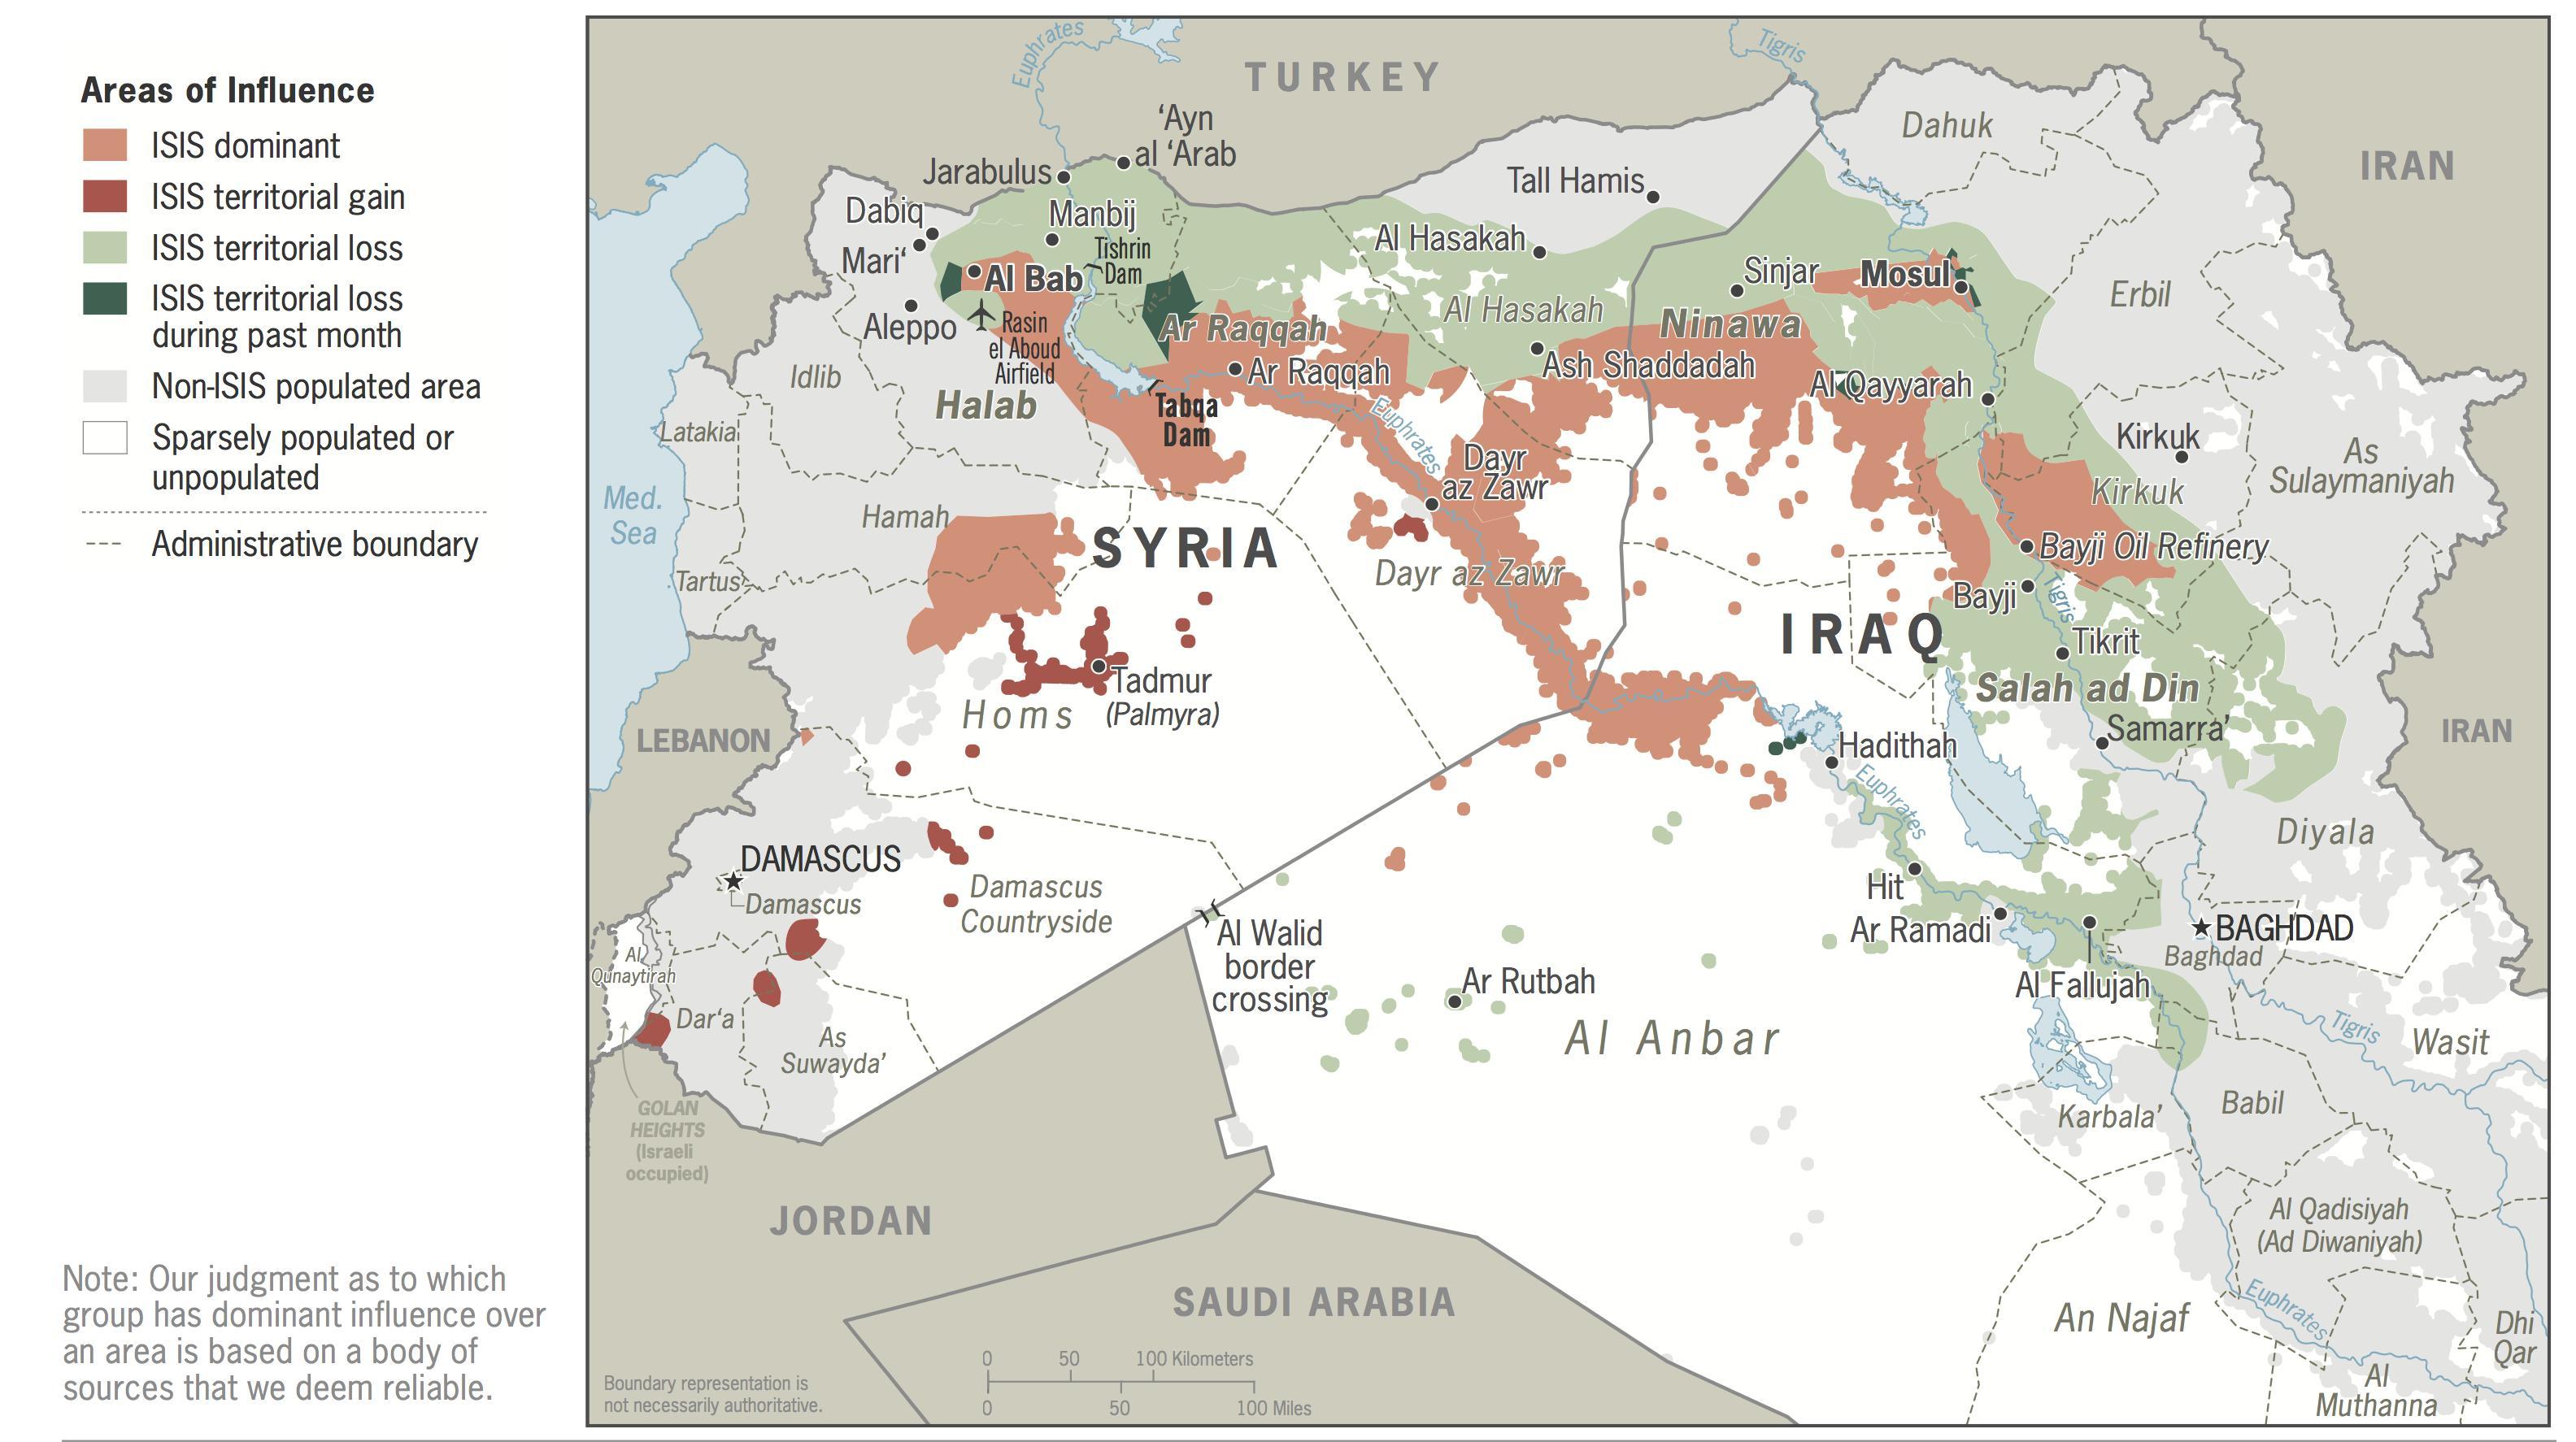 Daesh Areas of Influence – January 2017 Update